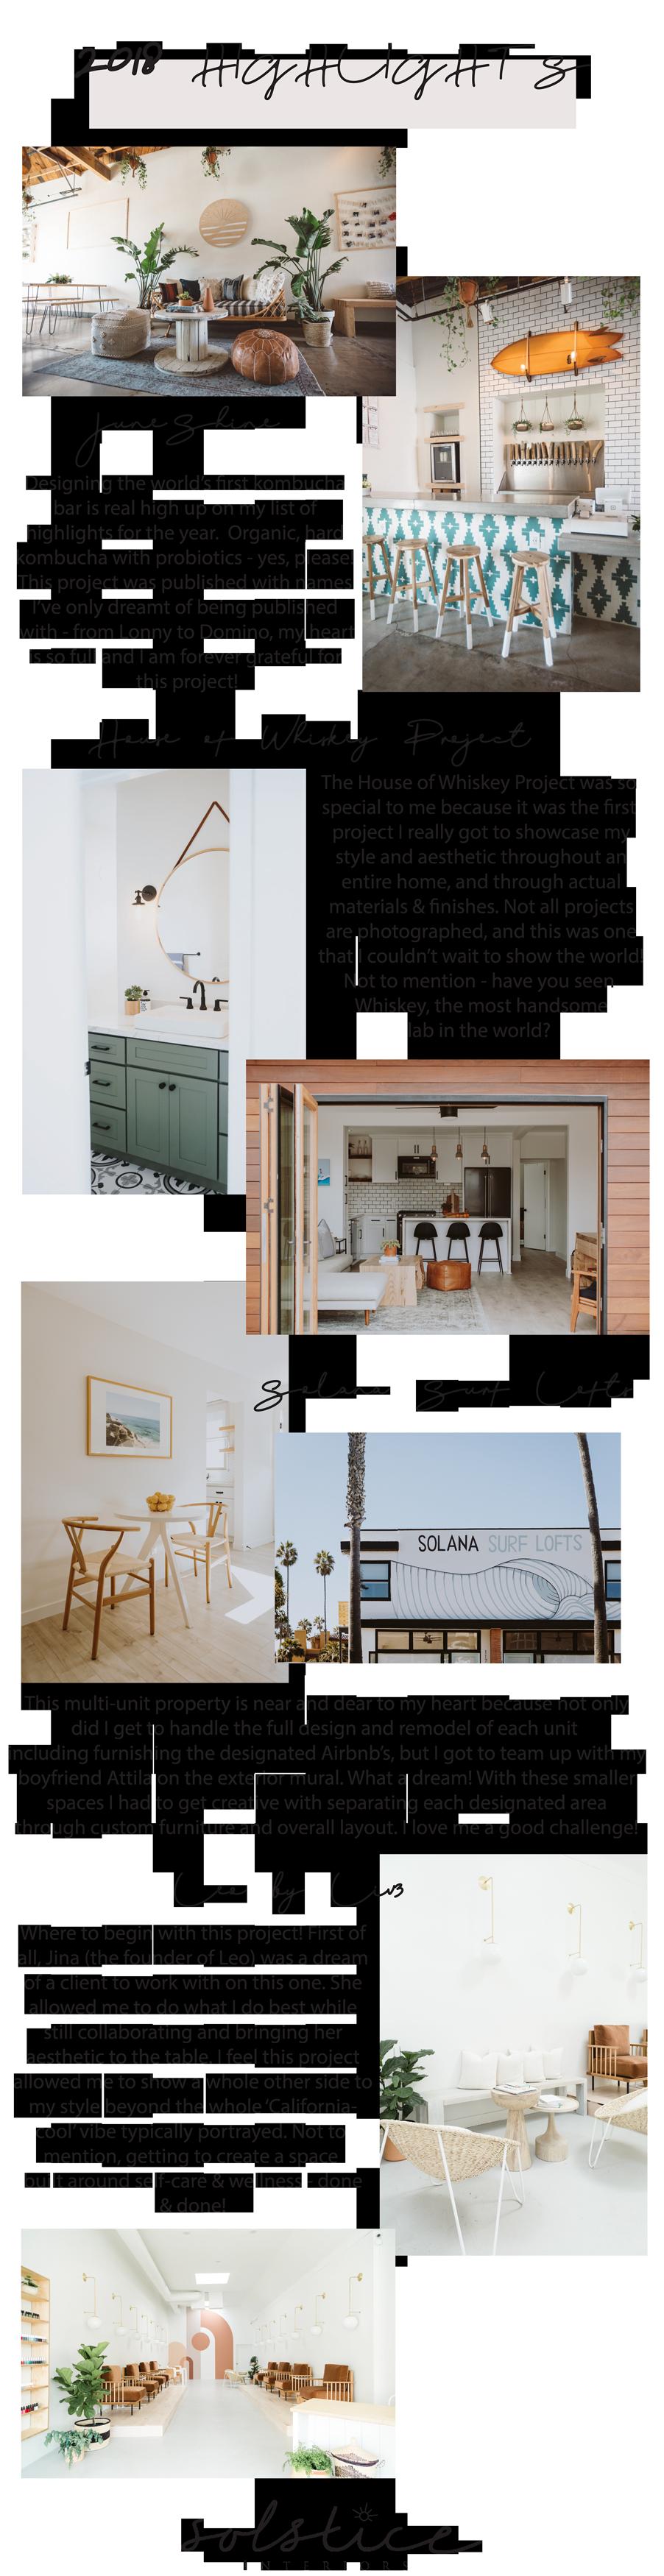 Solstice-Interiors-2018-Highlights-Blog